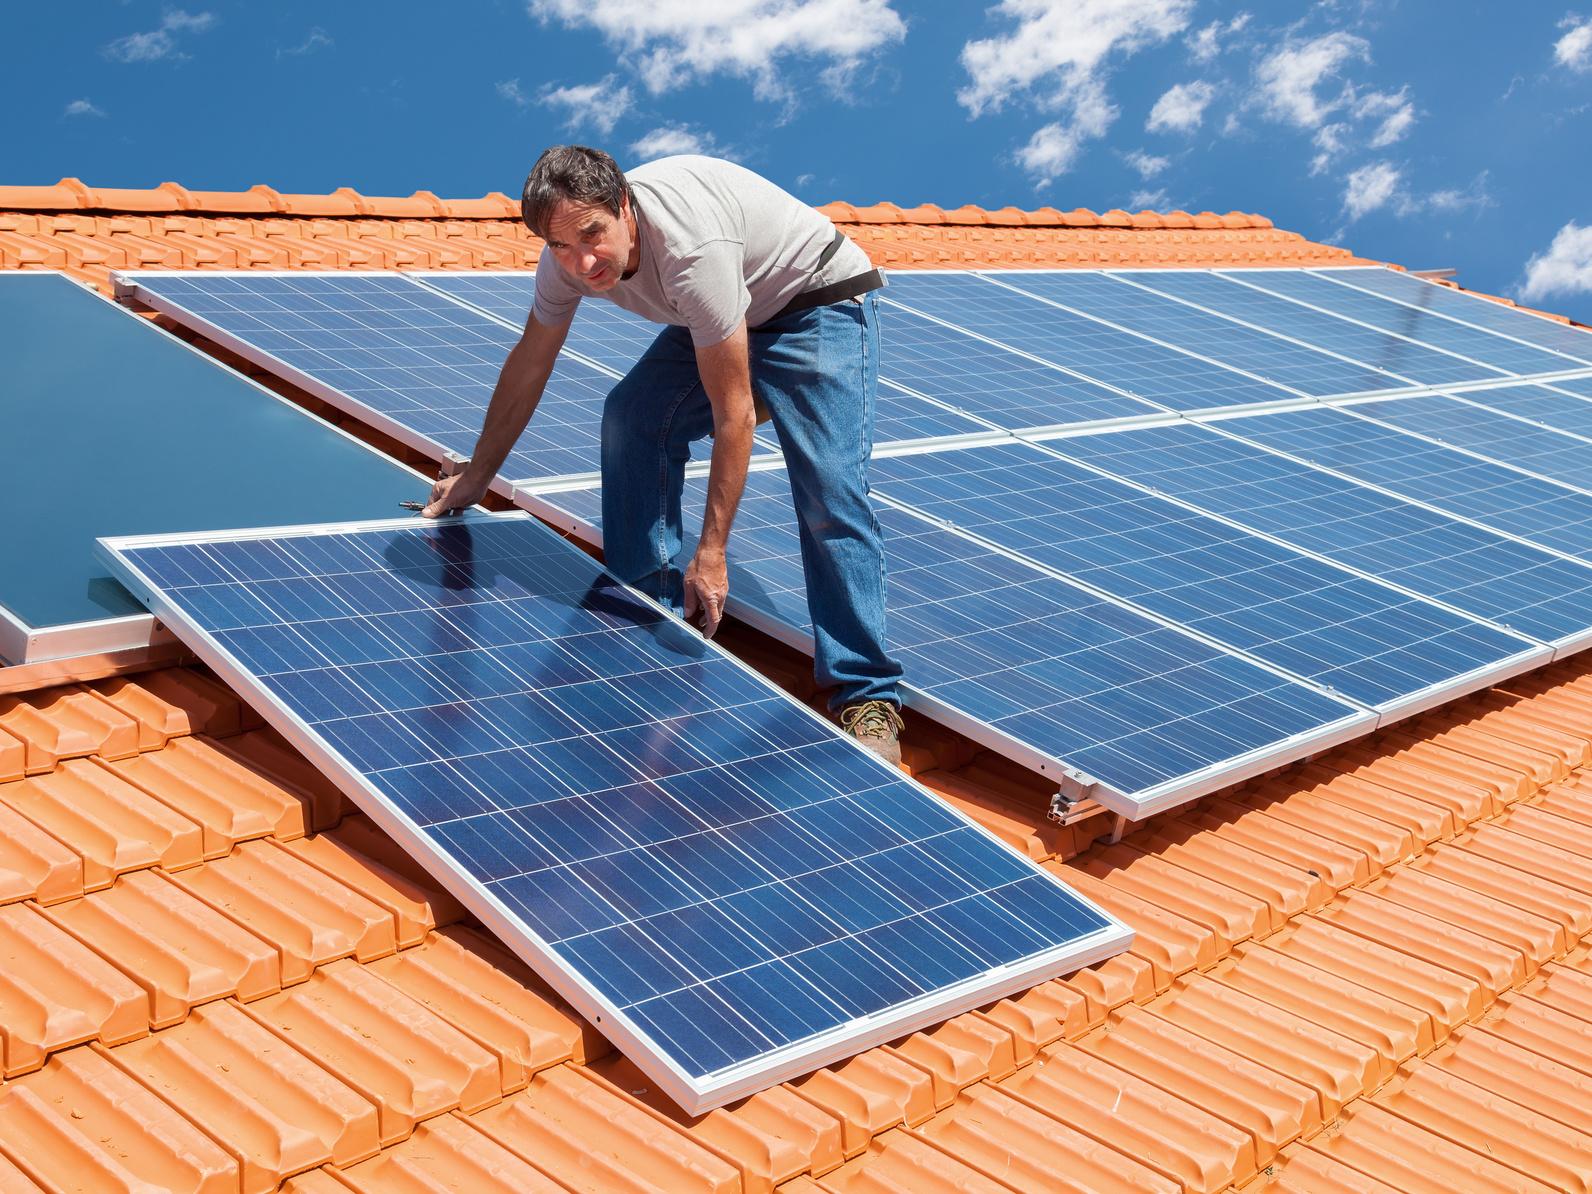 Photovoltaik forderung nrw